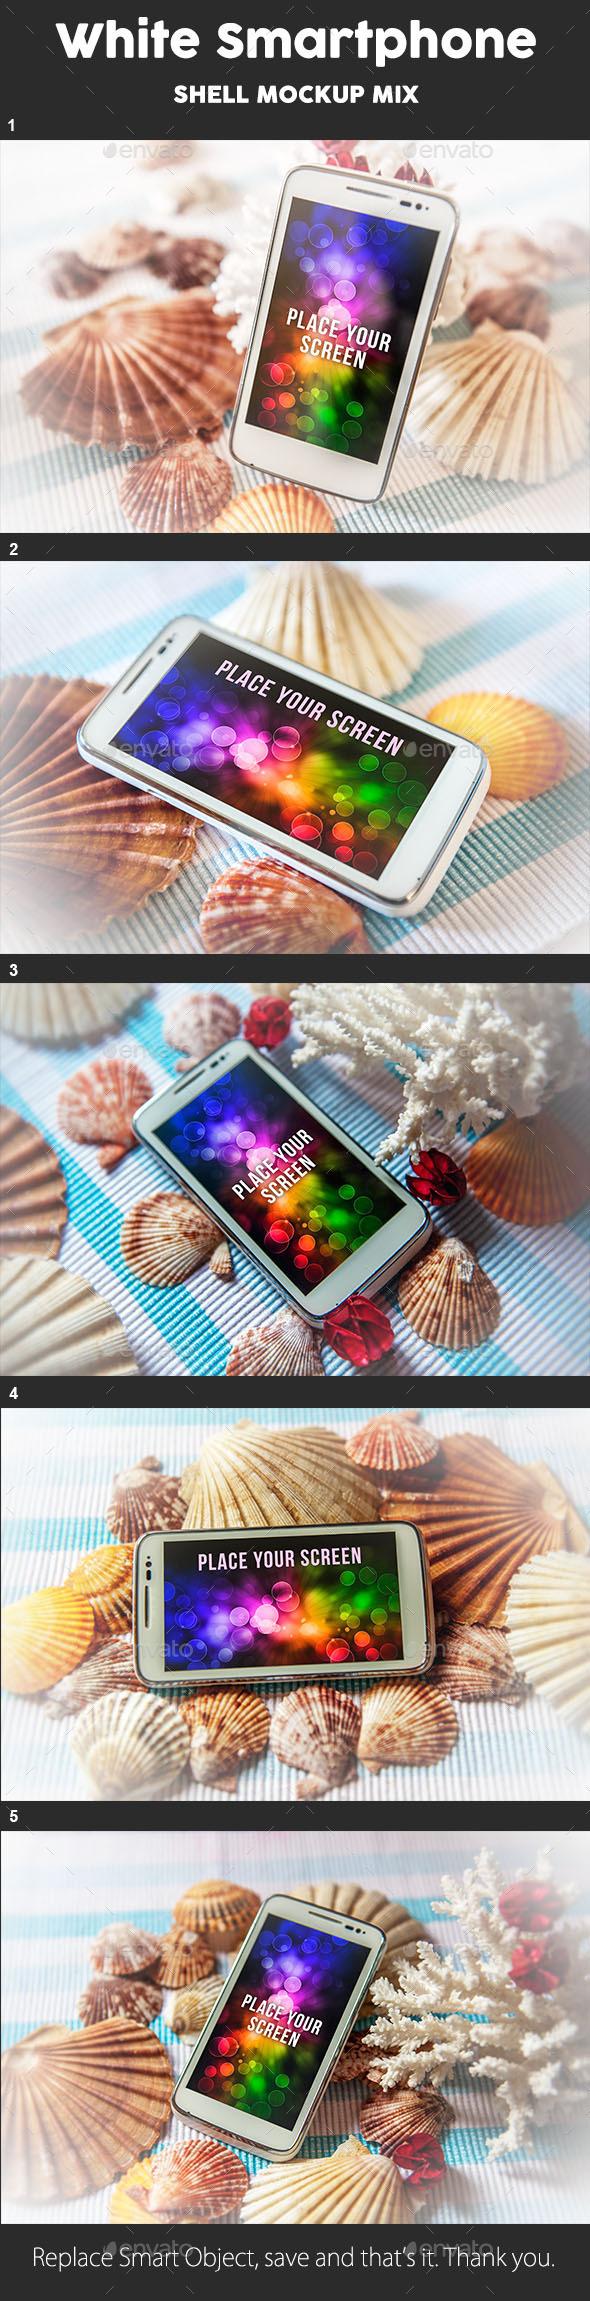 Smartphone Mock Up - Shell Theme - Mobile Displays